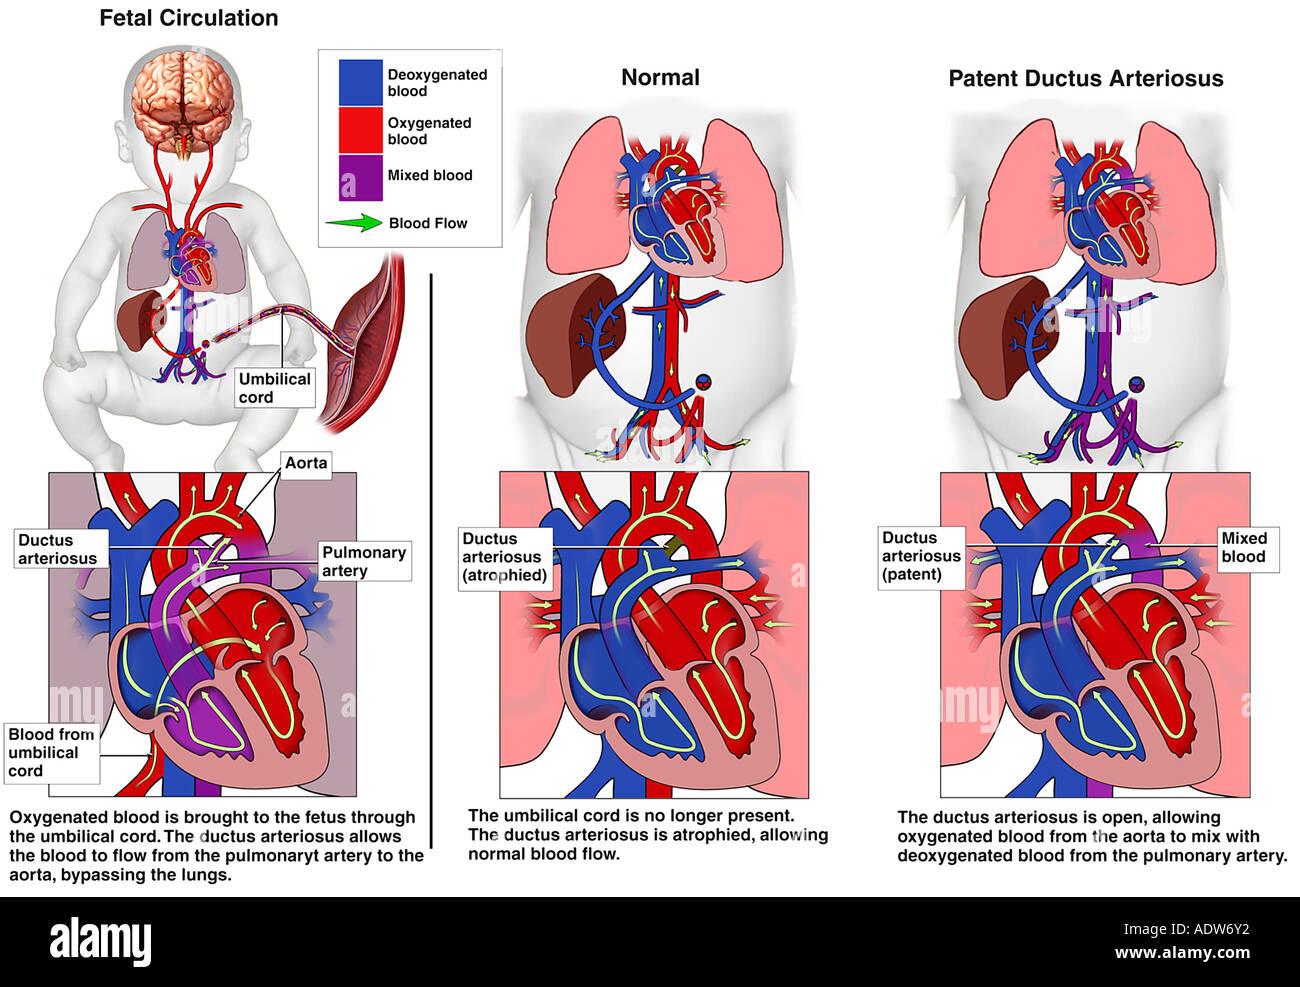 Congenital Heart Disease Explained